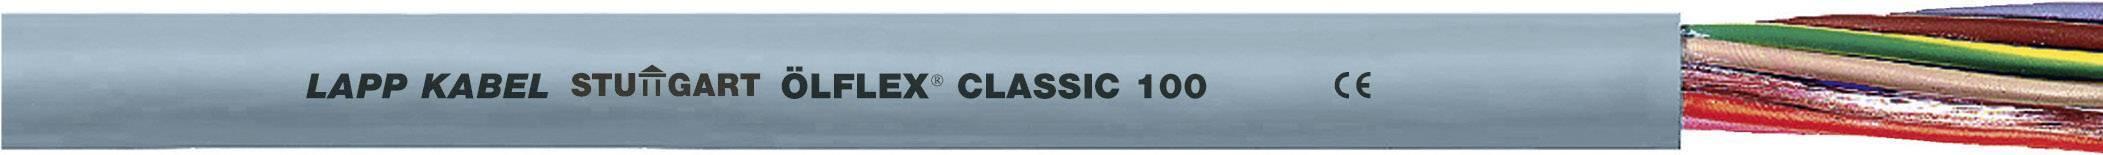 Kabel LappKabel Ölflex CLASSIC 100 7G1,5 (0010068), PVC, 8,9 mm, 500 V, šedá, 500 m